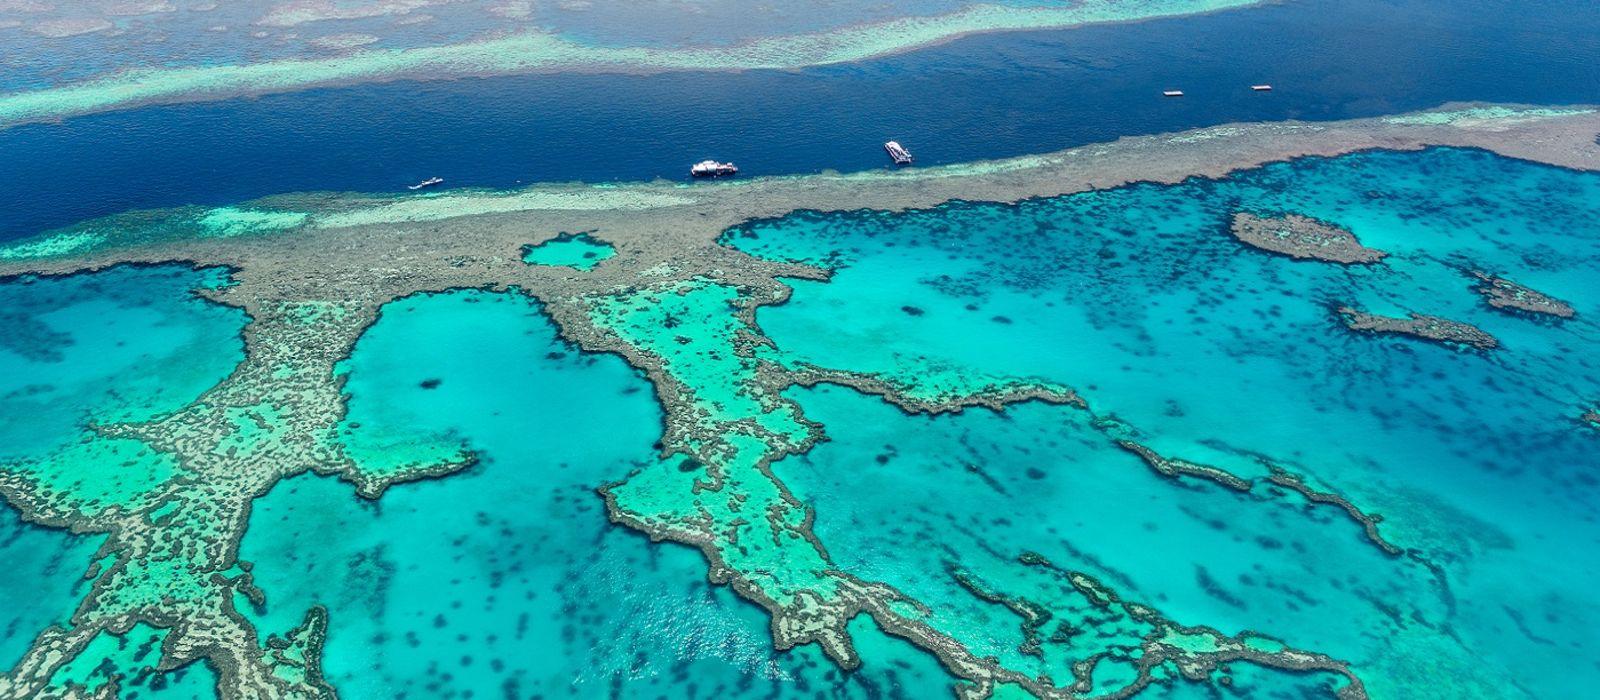 Australien: Großstadtleben & Great Barrier Reef Urlaub 5